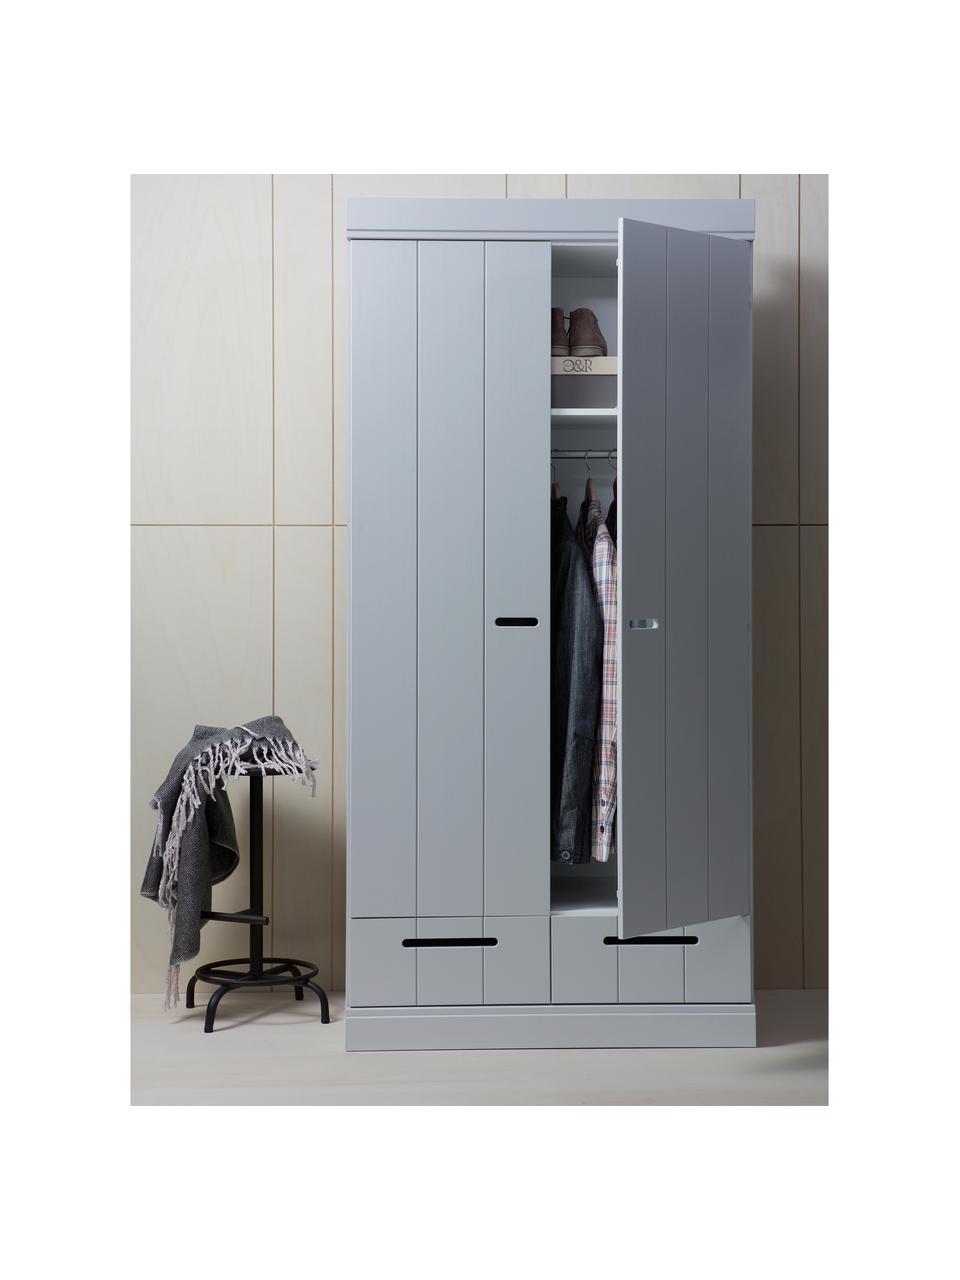 Armadio grigio chiaro a 2 ante Connect, Ripiani: melamina, Grigio chiaro, Larg. 94 x Alt. 195 cm